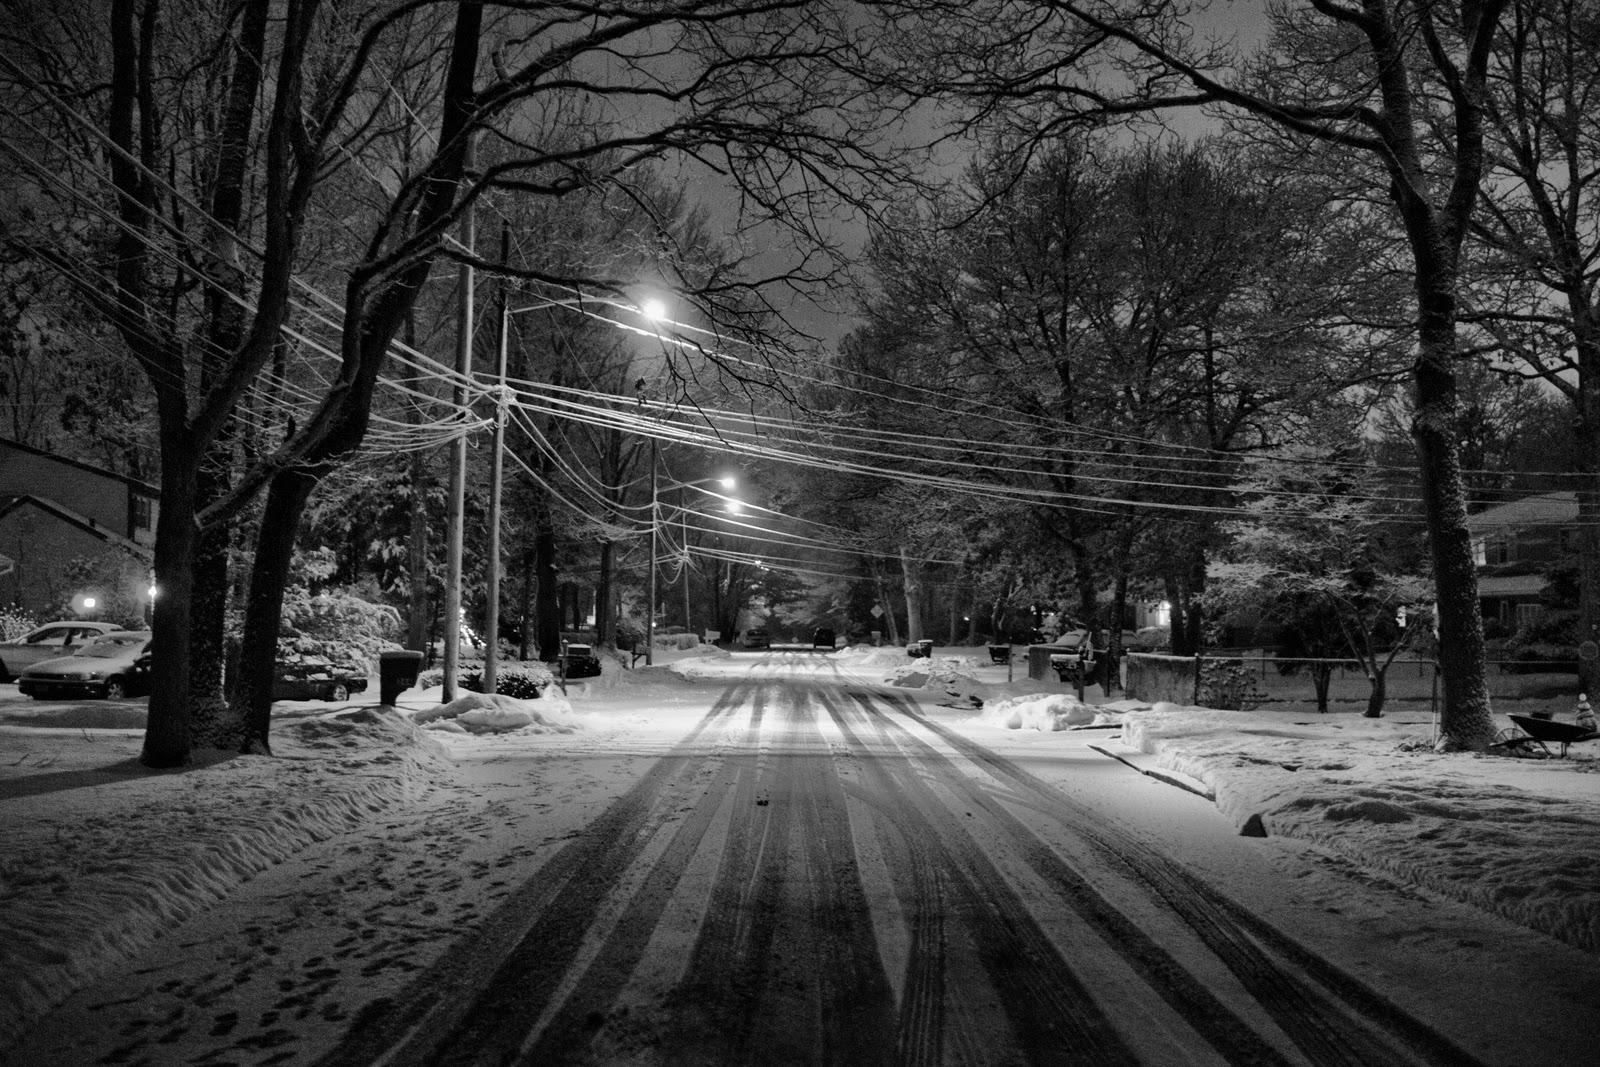 Winter at Night